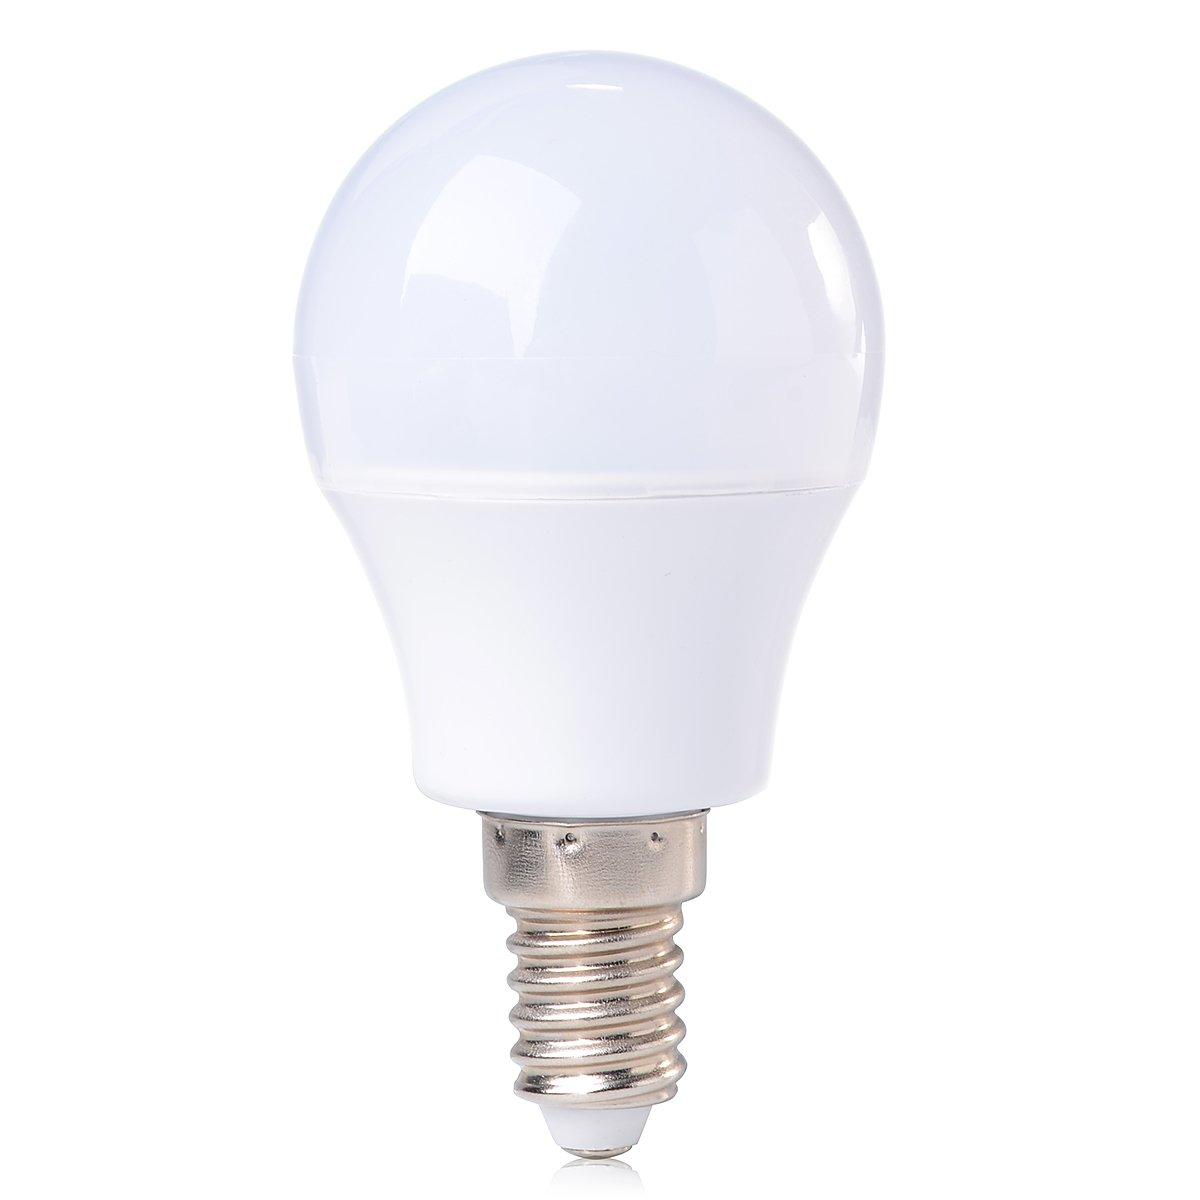 Lampade led dimmerabili tutte le offerte cascare a fagiolo for Leroy merlin lampadine led